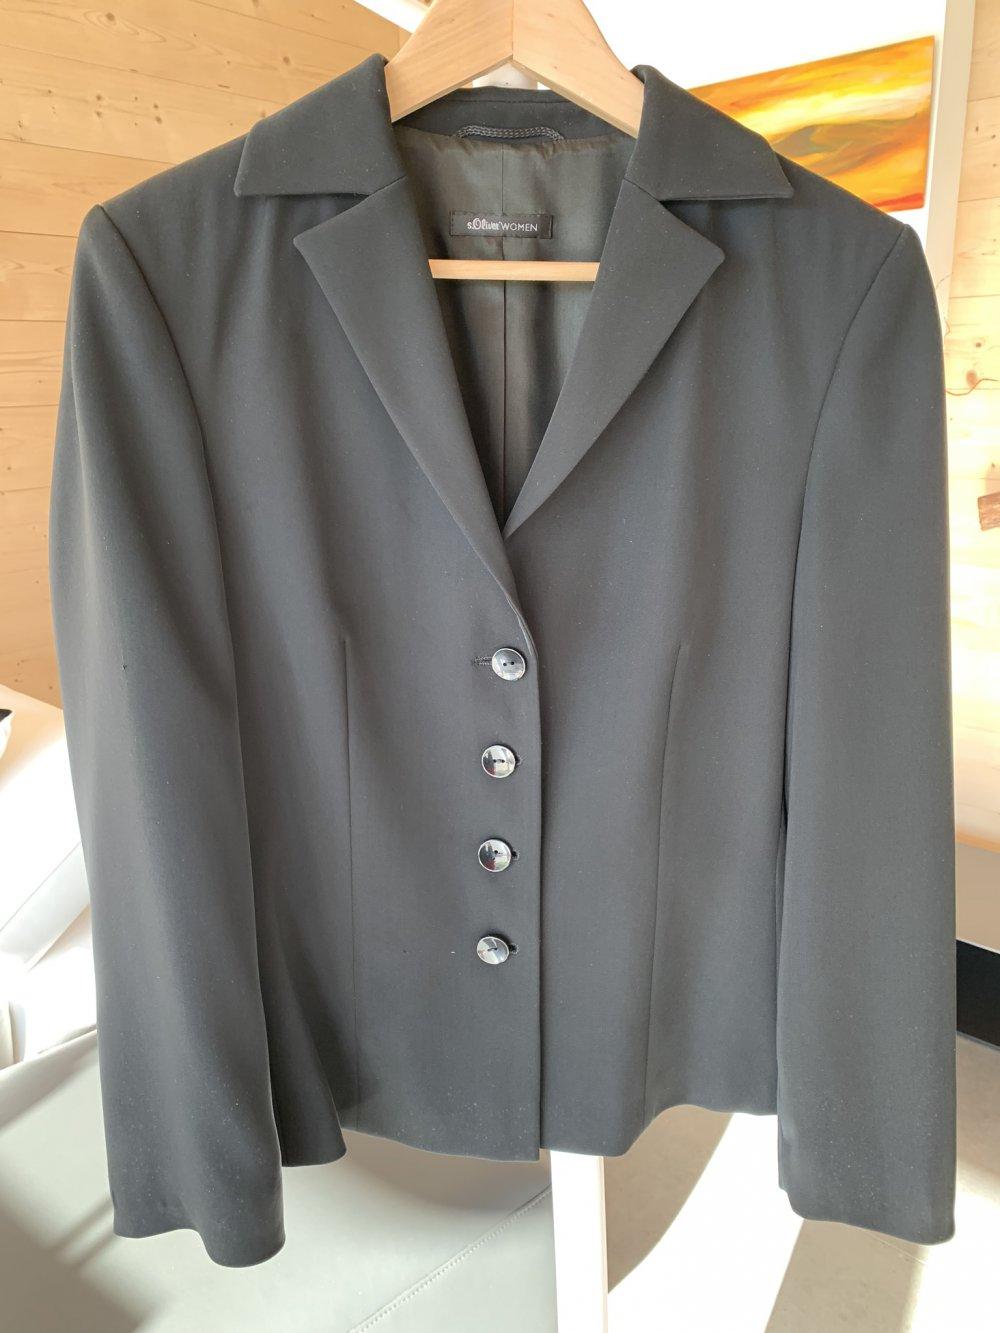 eleganter damen-anzug, business suit, abendgarderobe